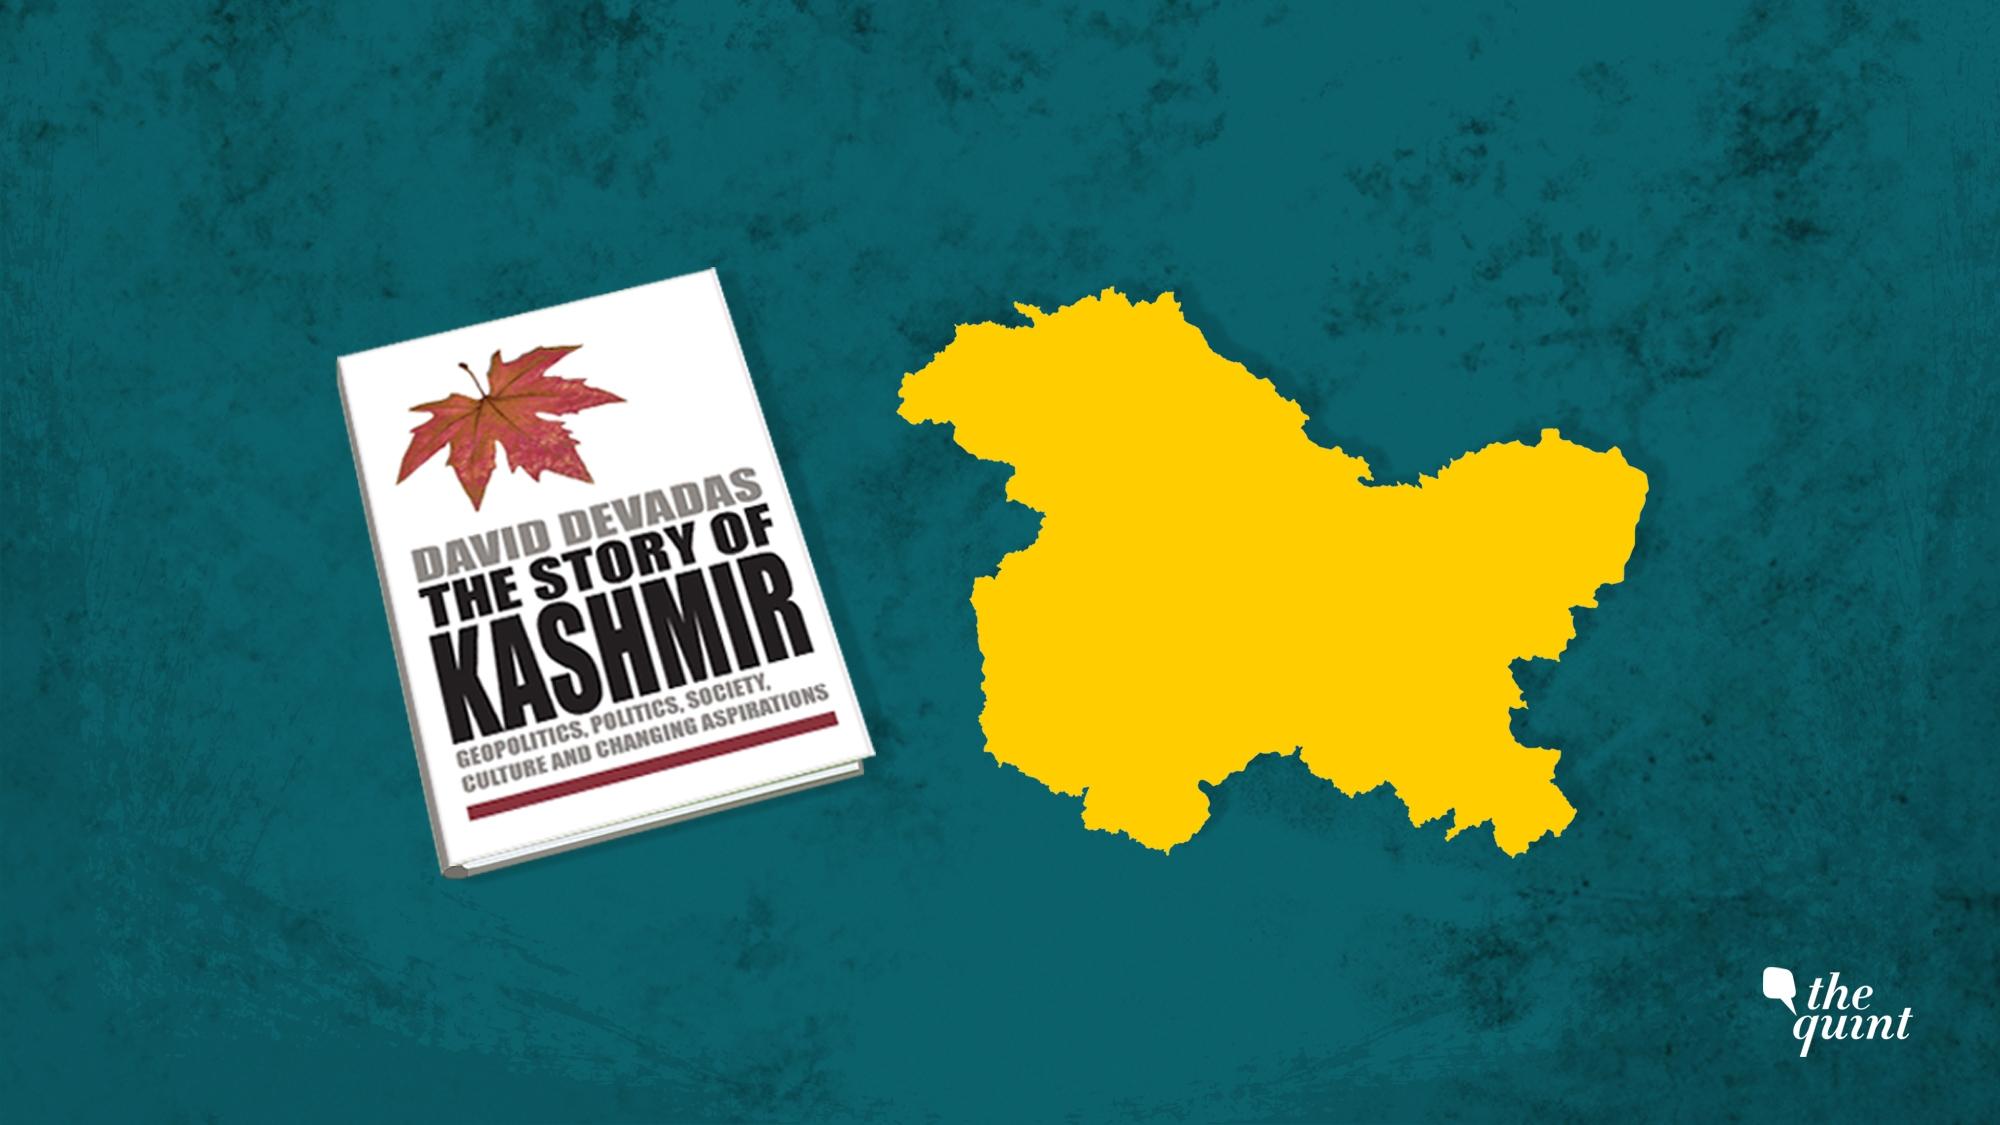 'Story of Kashmir': Journos, Actor & Ex-J&K Advisor in Discussion